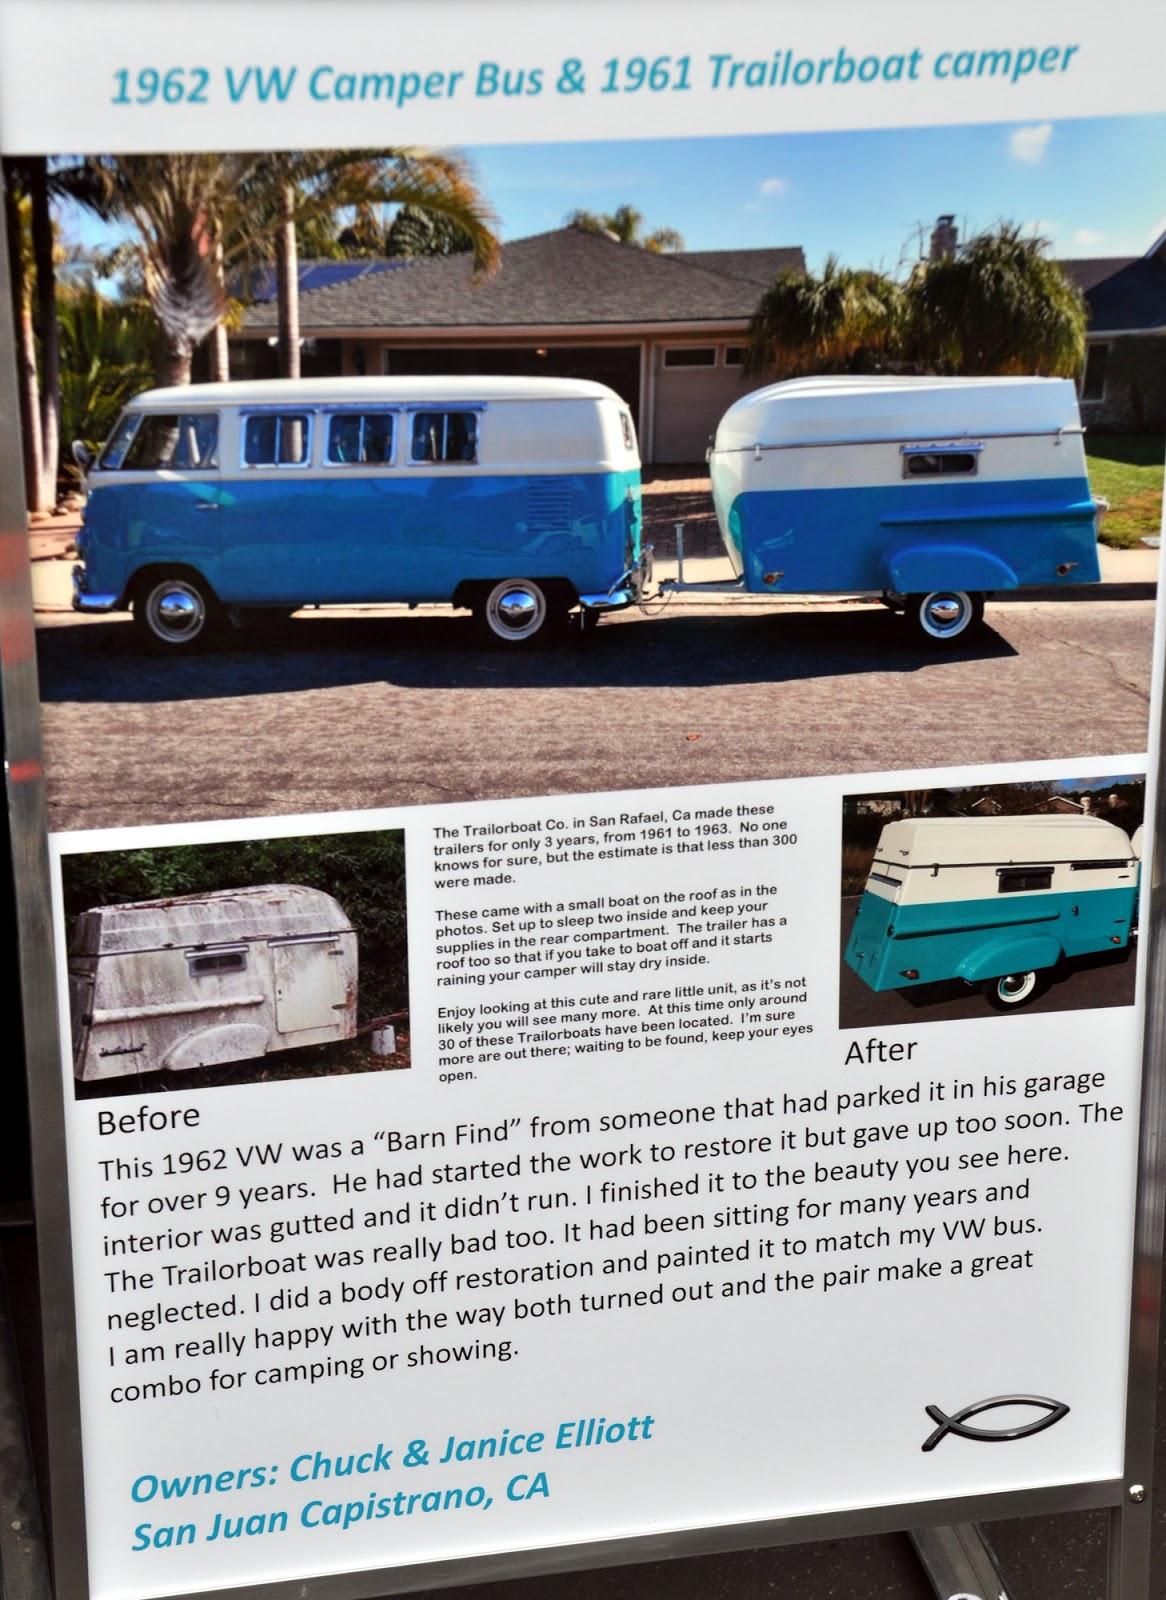 1962 Camper Van and 1961 Trailerboat Camper